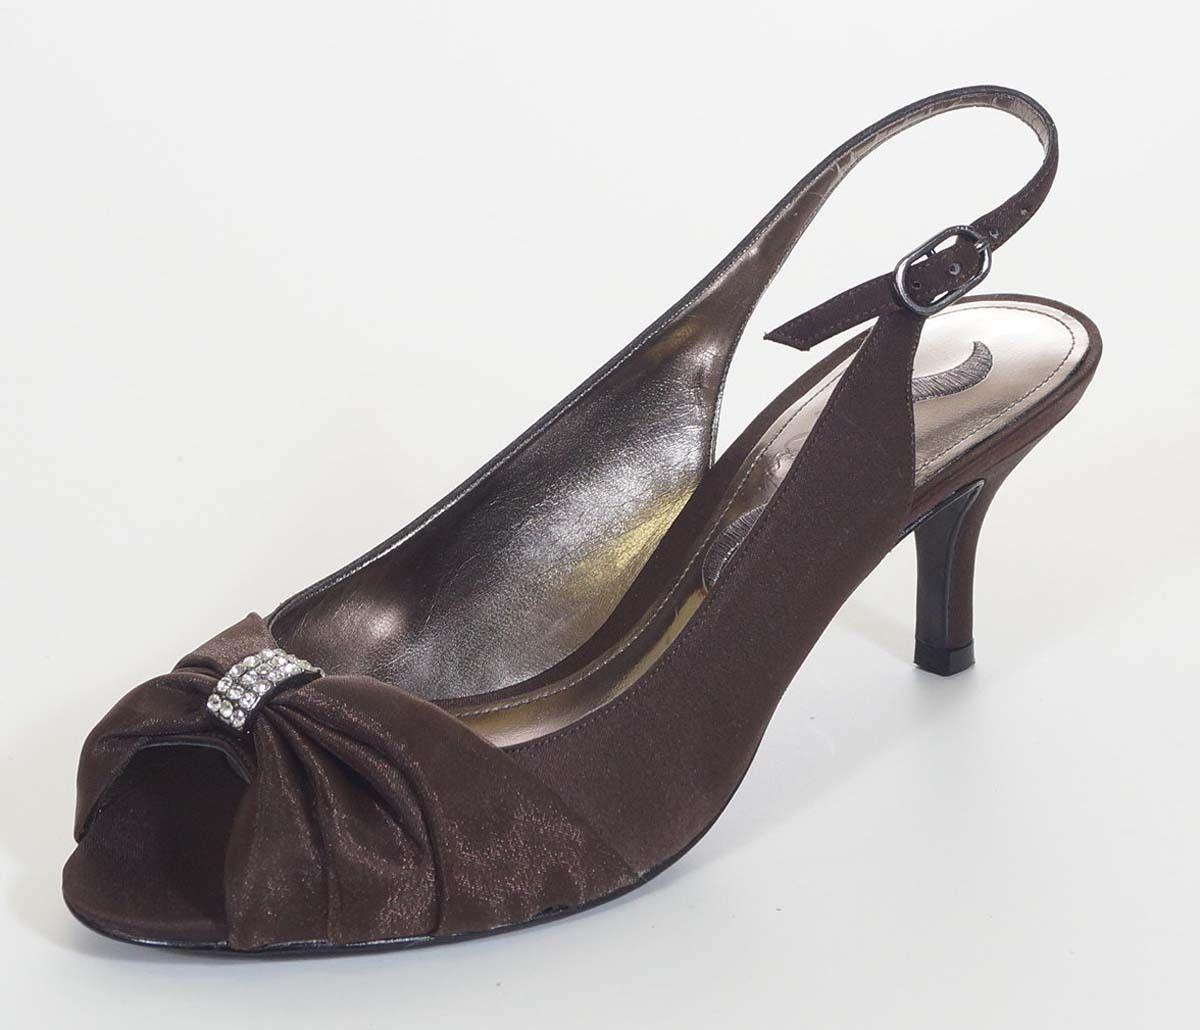 Brown Women's Heels: sisk-profi.ga - Your Online Women's Shoes Store! Get 5% in rewards with Club O!